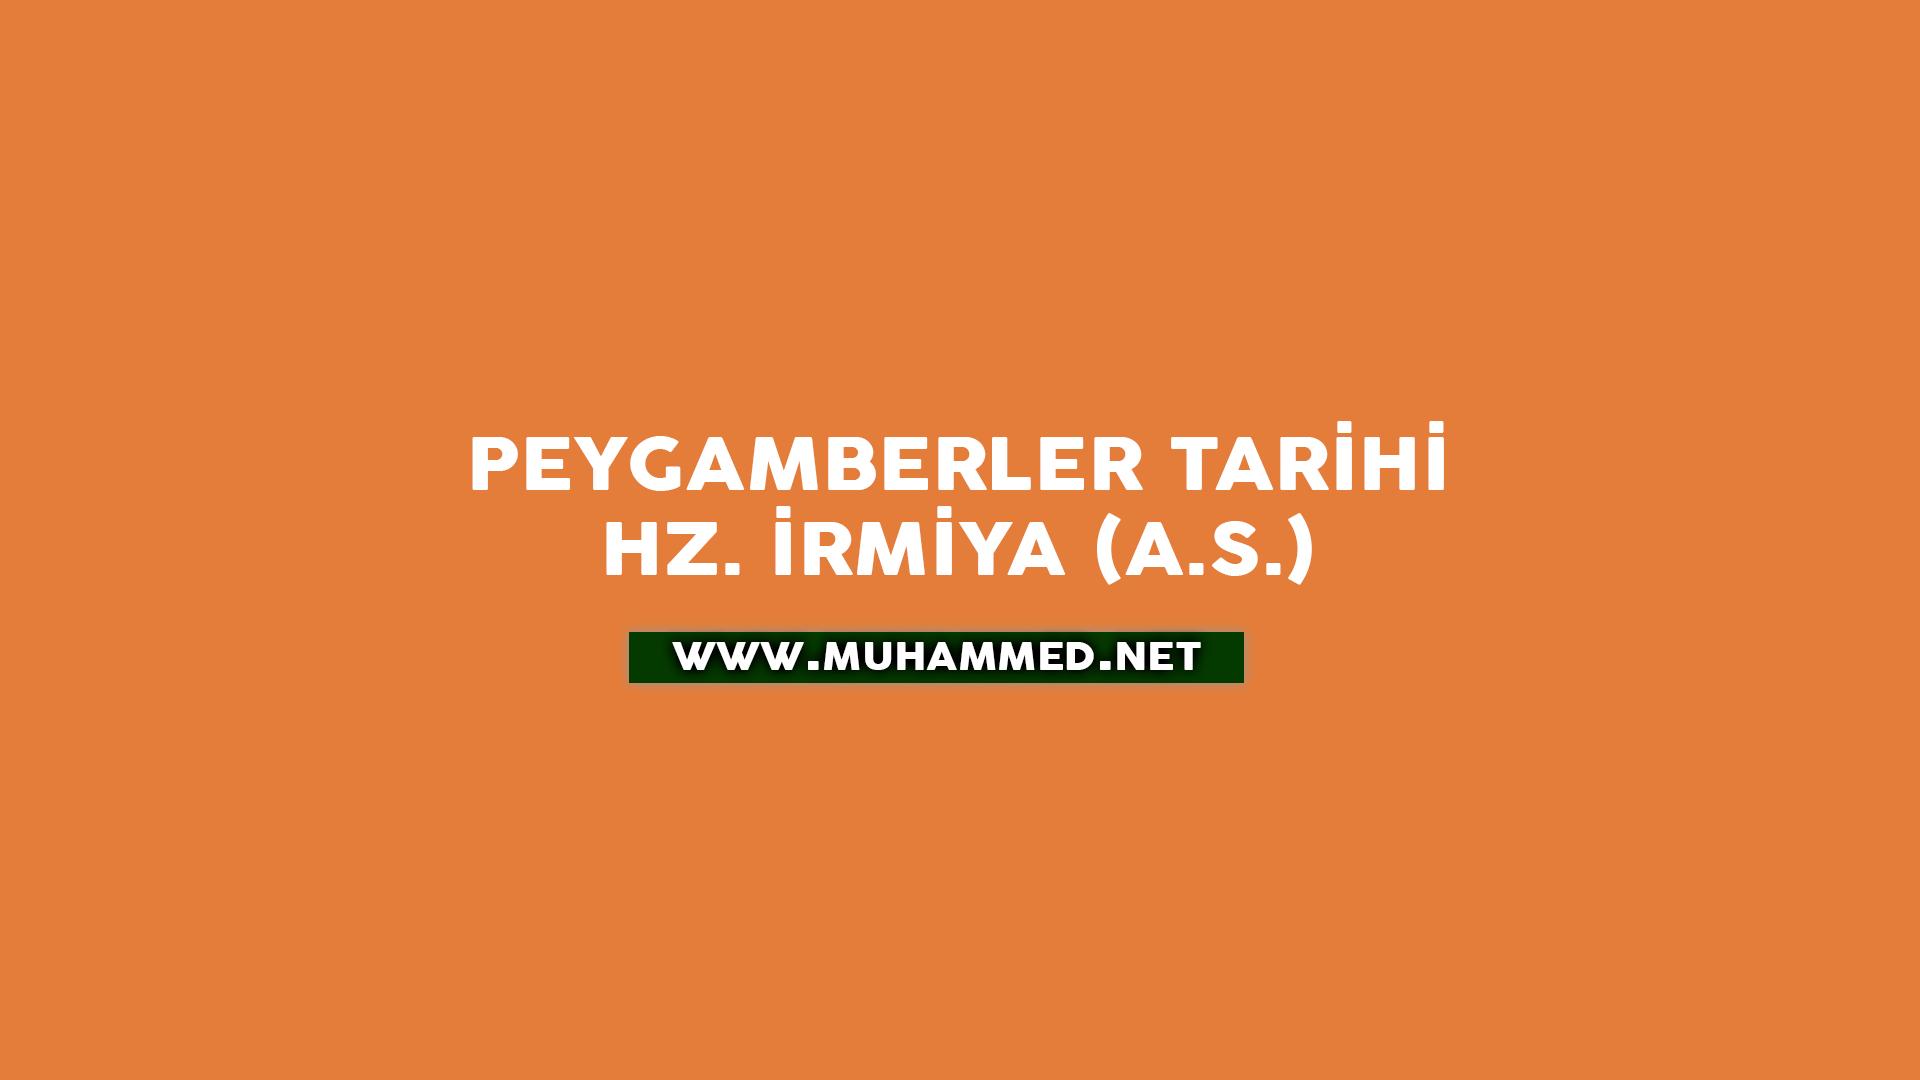 Hz. İrmiya (a.s.)